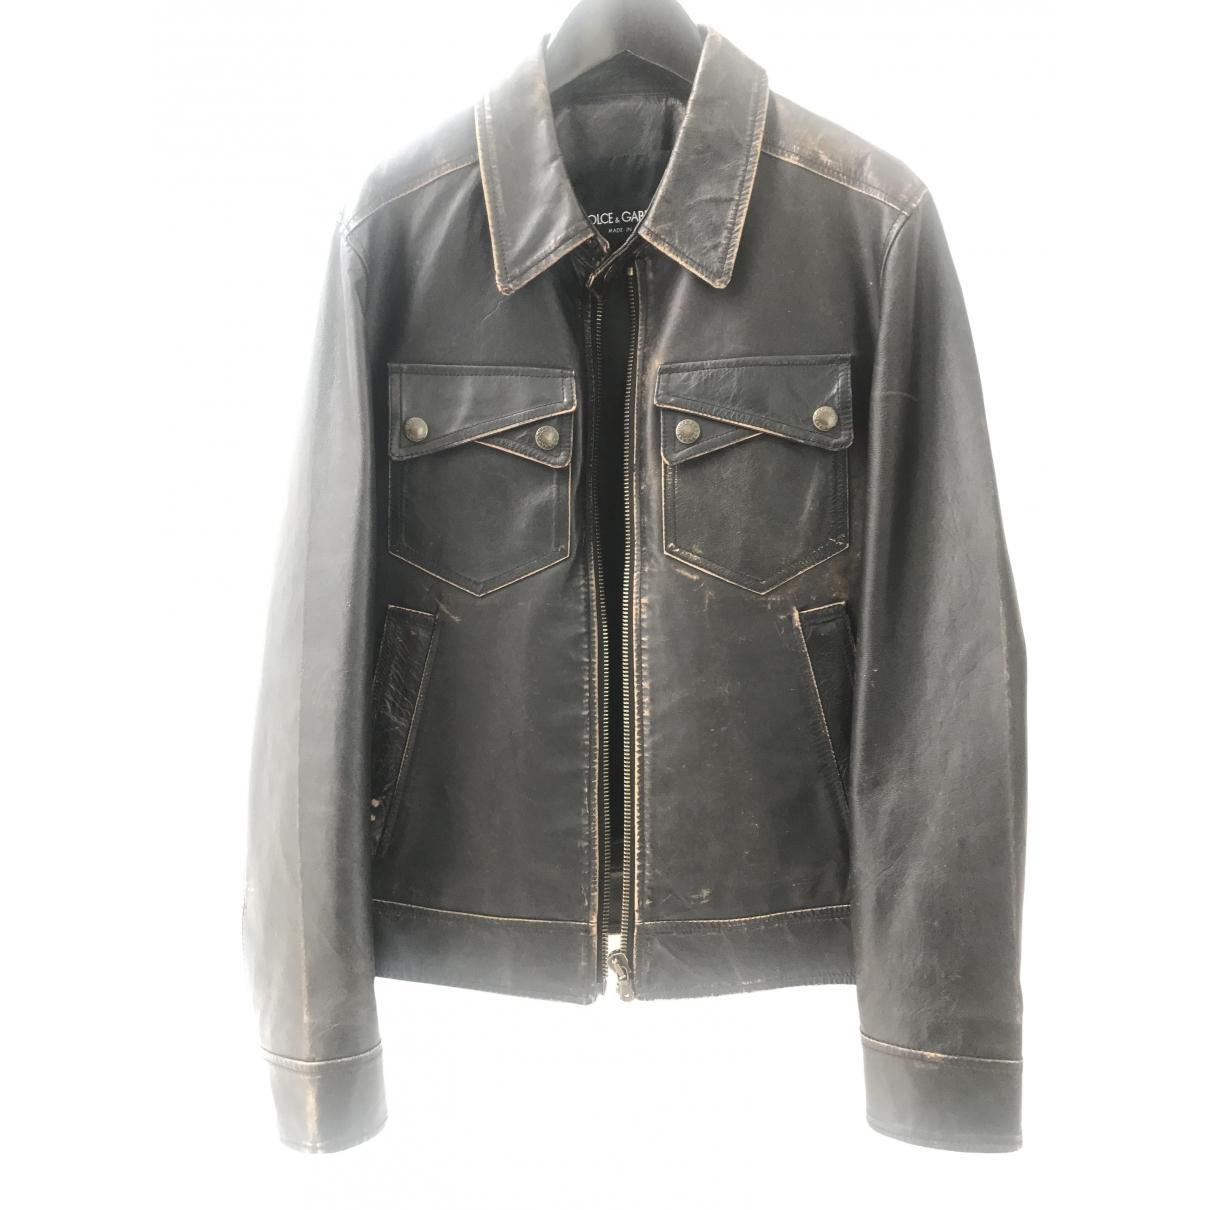 Dolce & Gabbana \N Brown Leather jacket  for Men M International